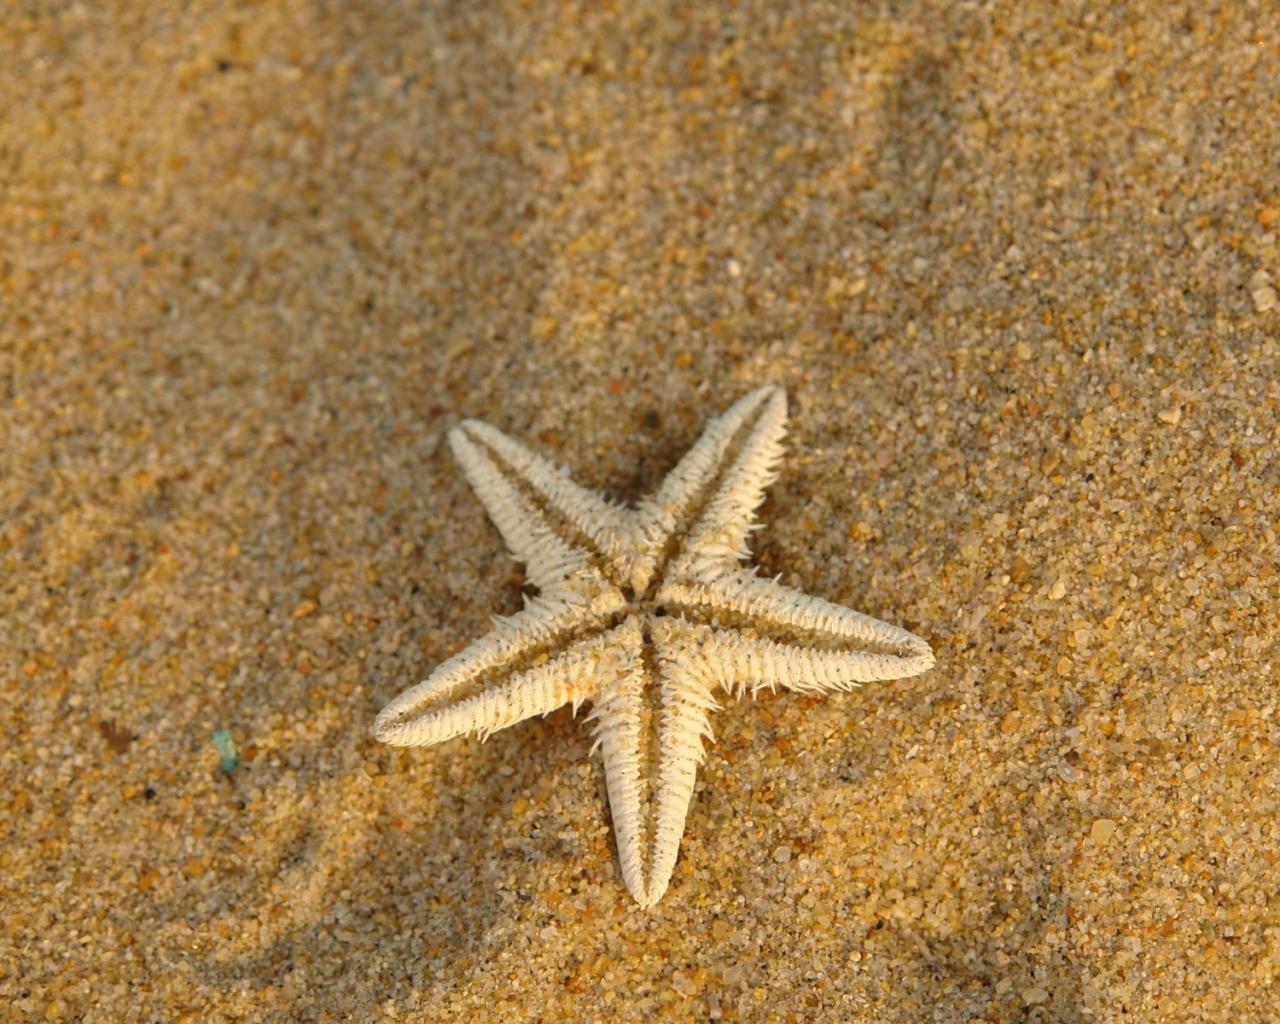 Estrella de mar en la arena - 1280x1024